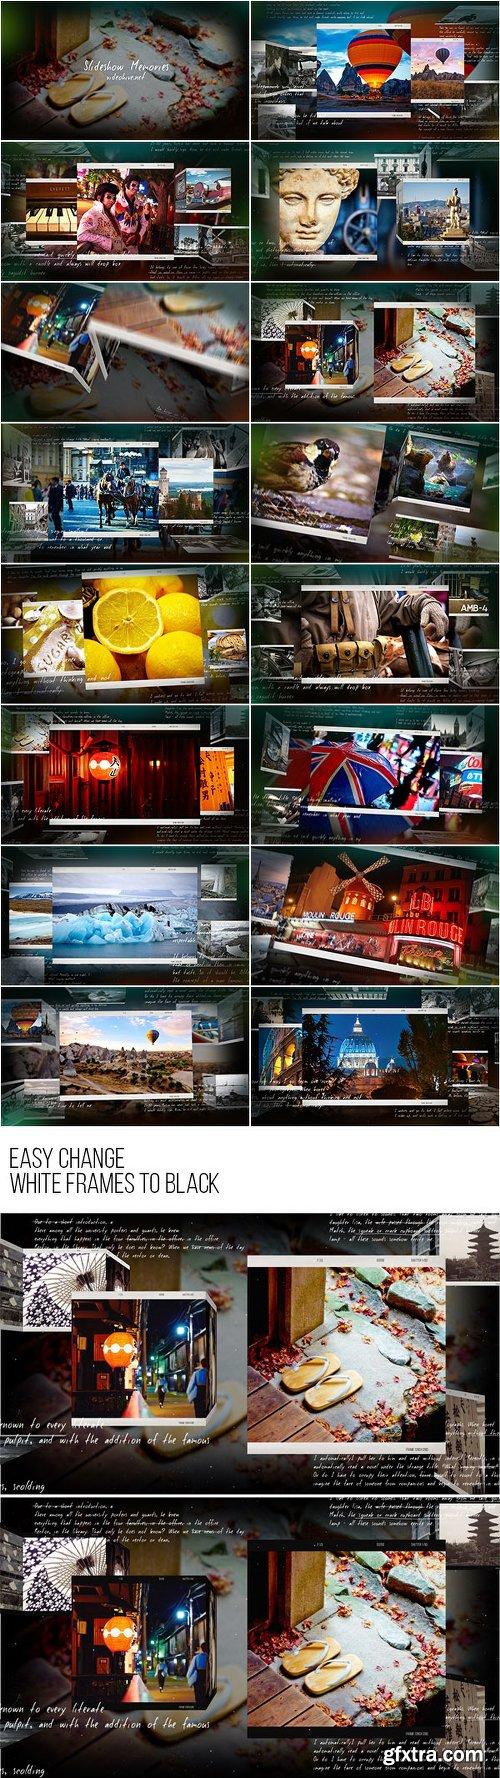 Videohive Slideshow Memories 12460886